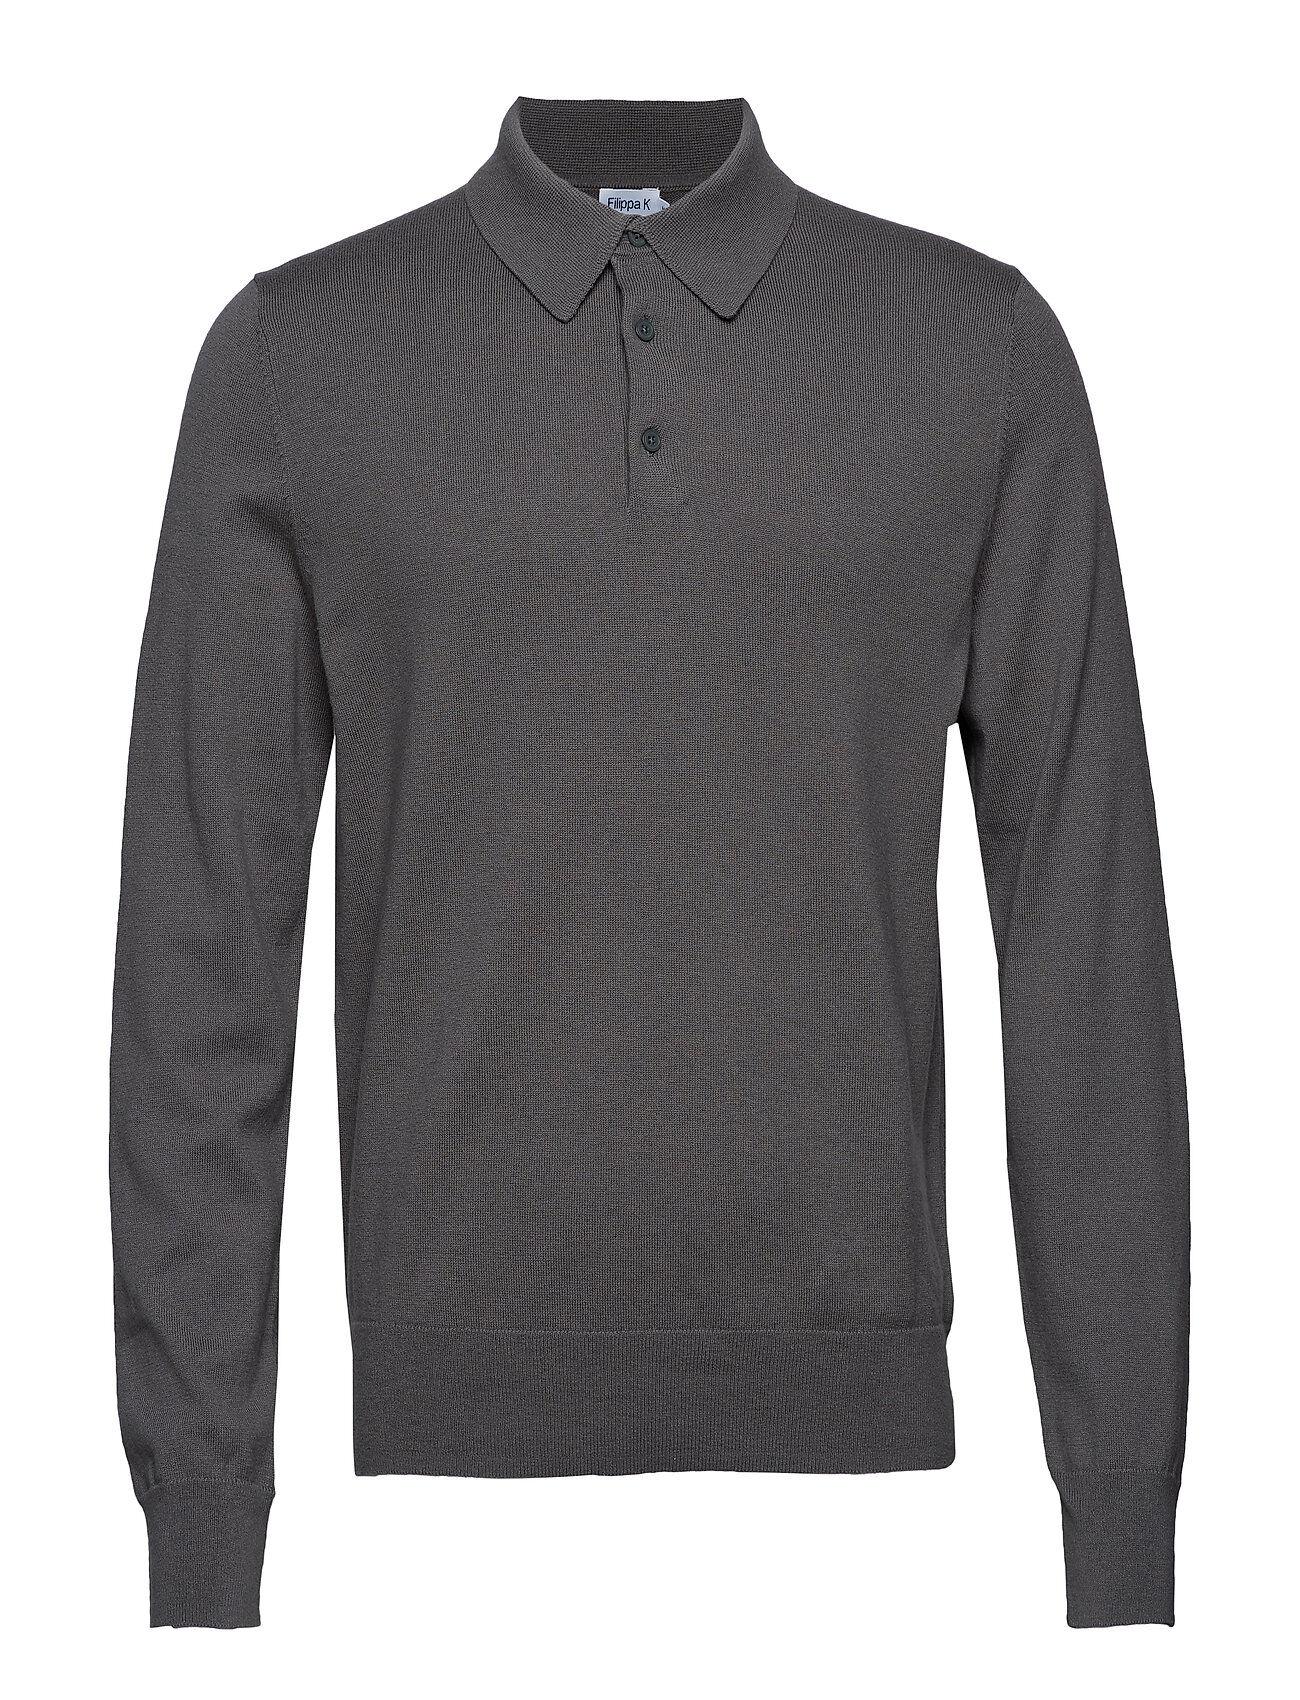 Filippa K M. Knitted Polo Shirt Polos Long-sleeved Harmaa